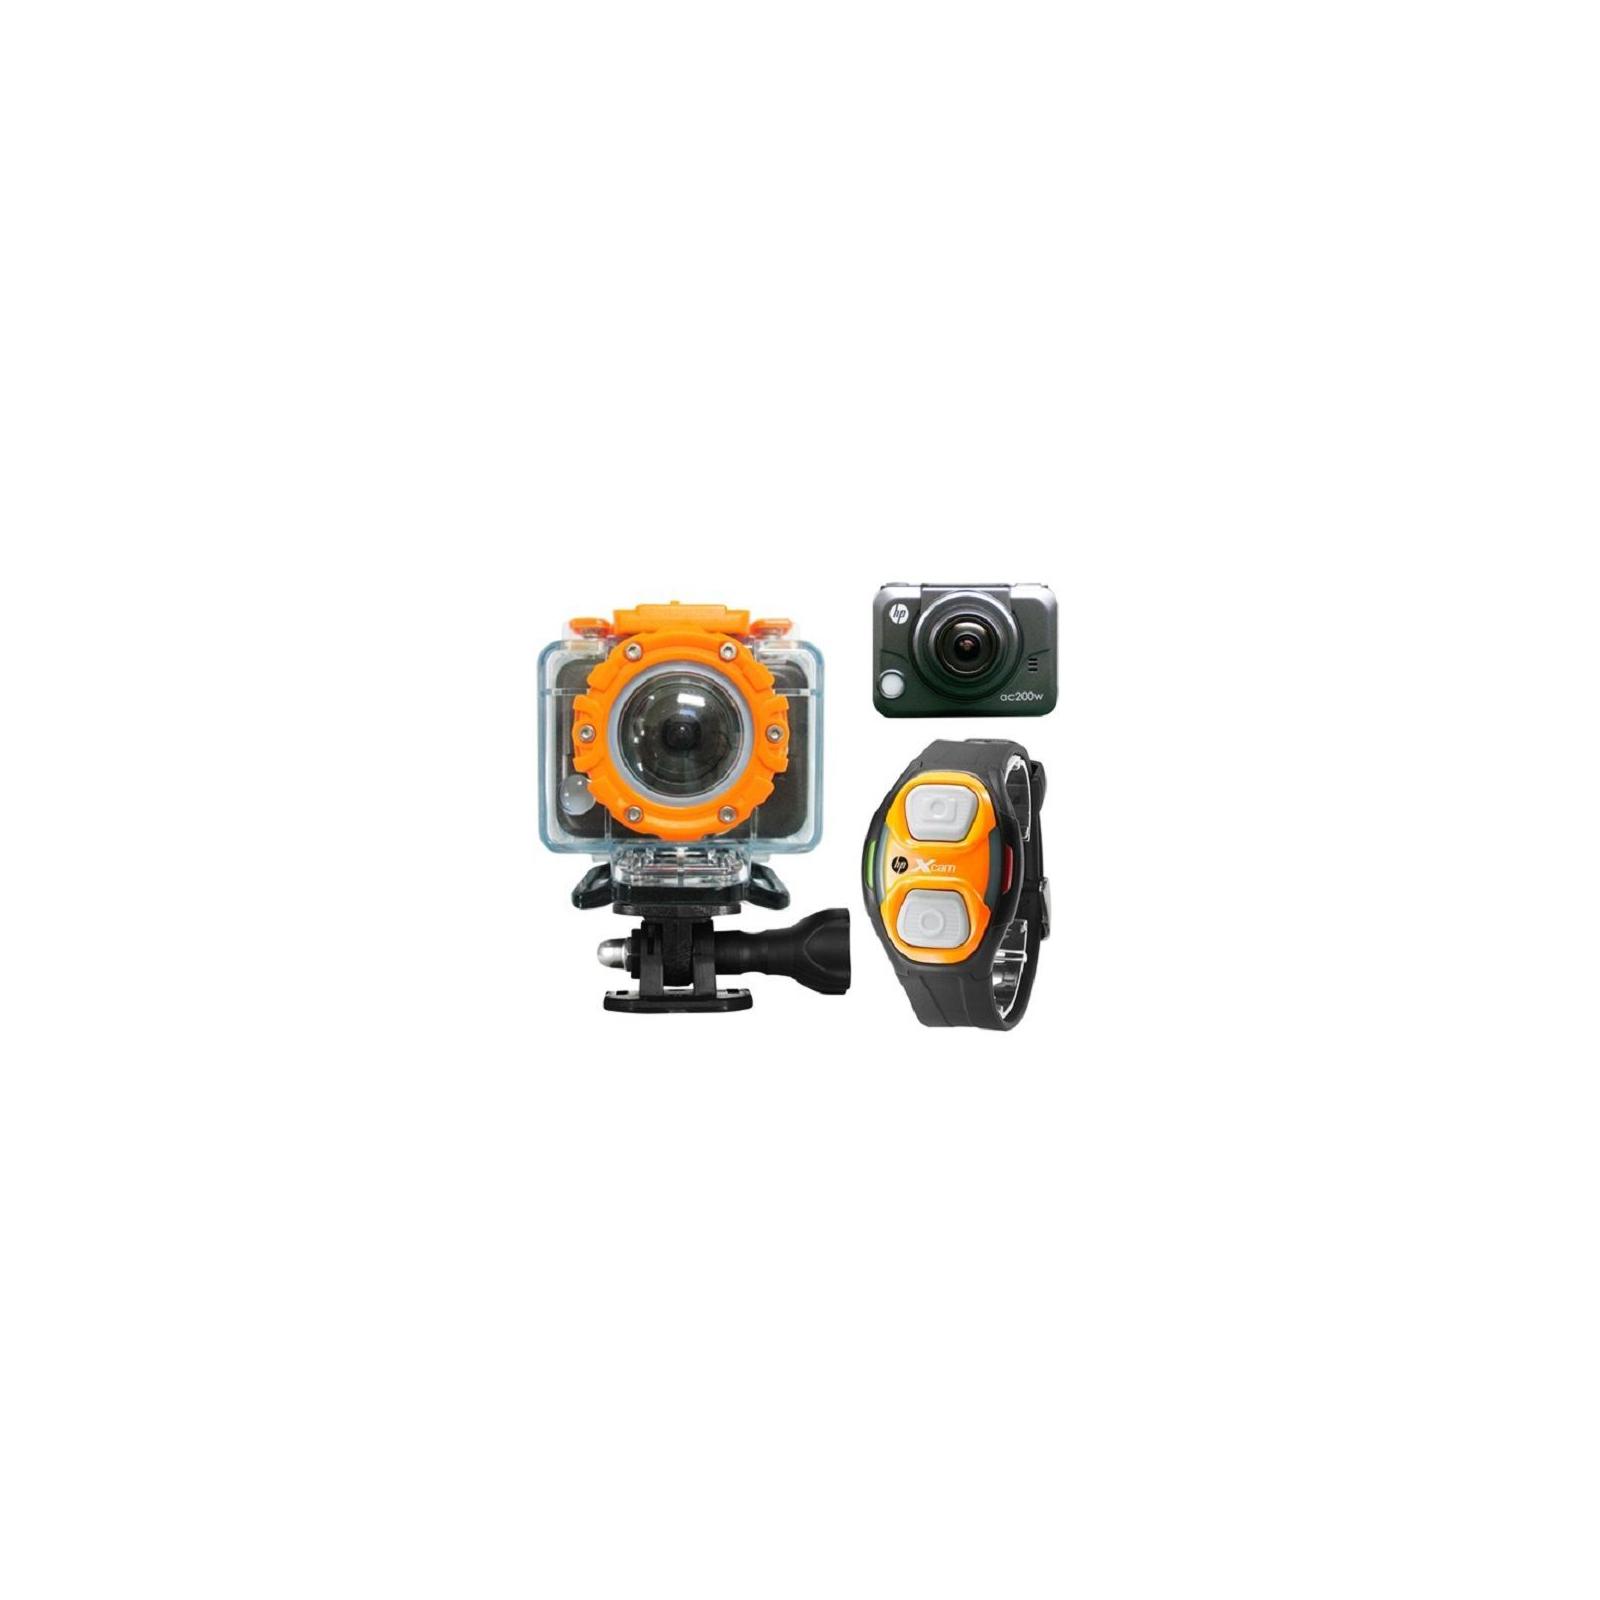 Экшн-камера HP ac200w изображение 3